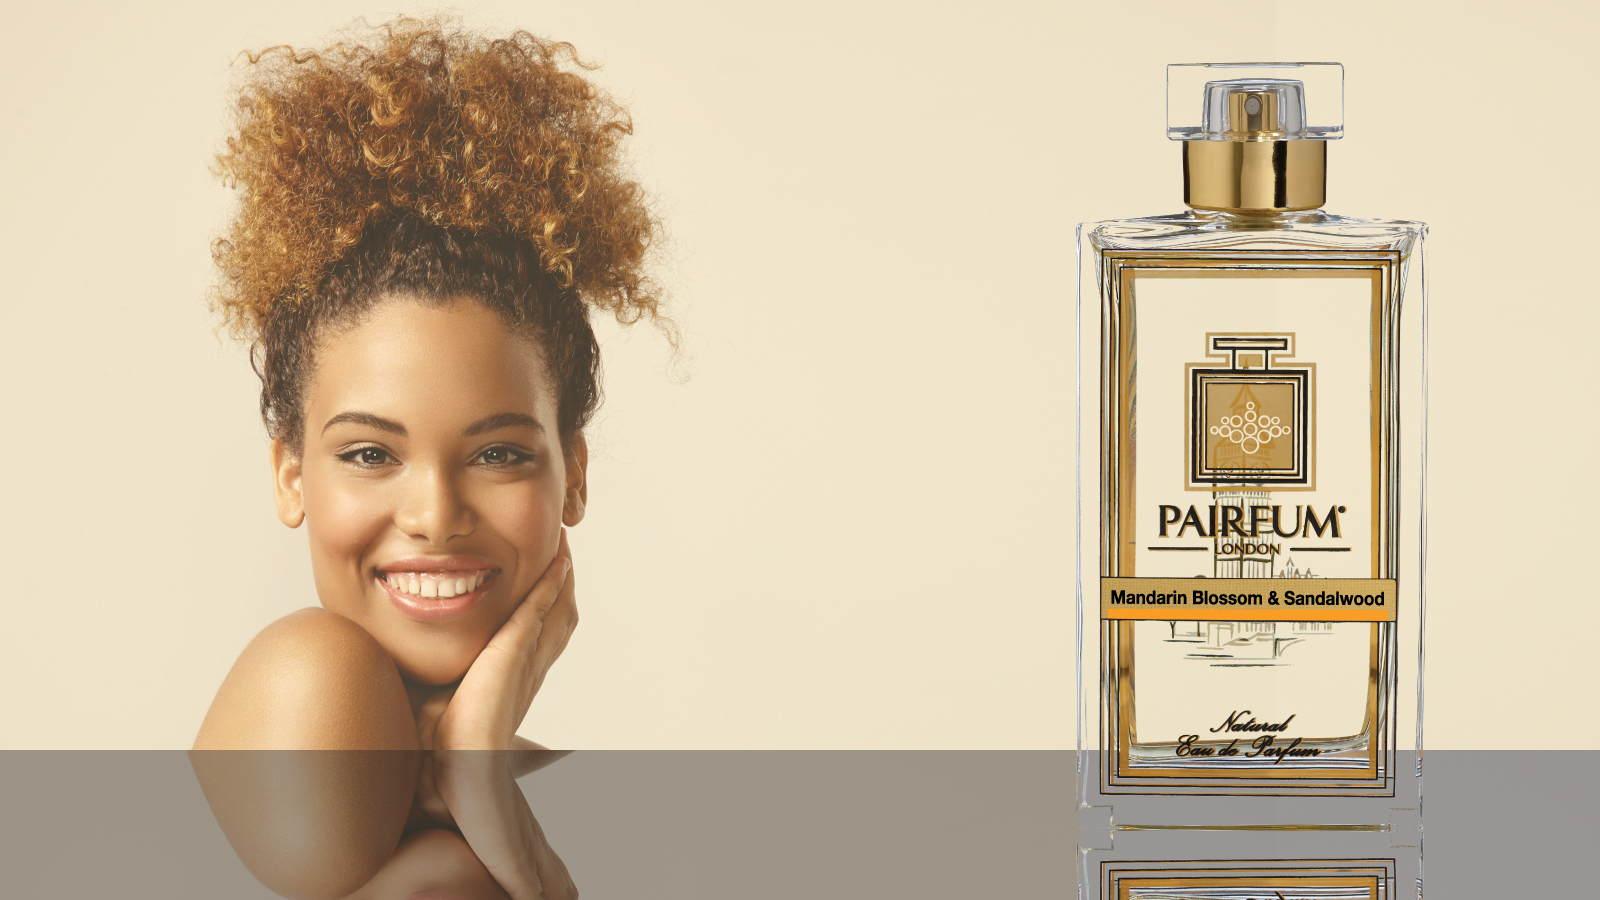 Eau De Parfum Person Reflection Mandarin Blossom Sandalwood Woman 16 9